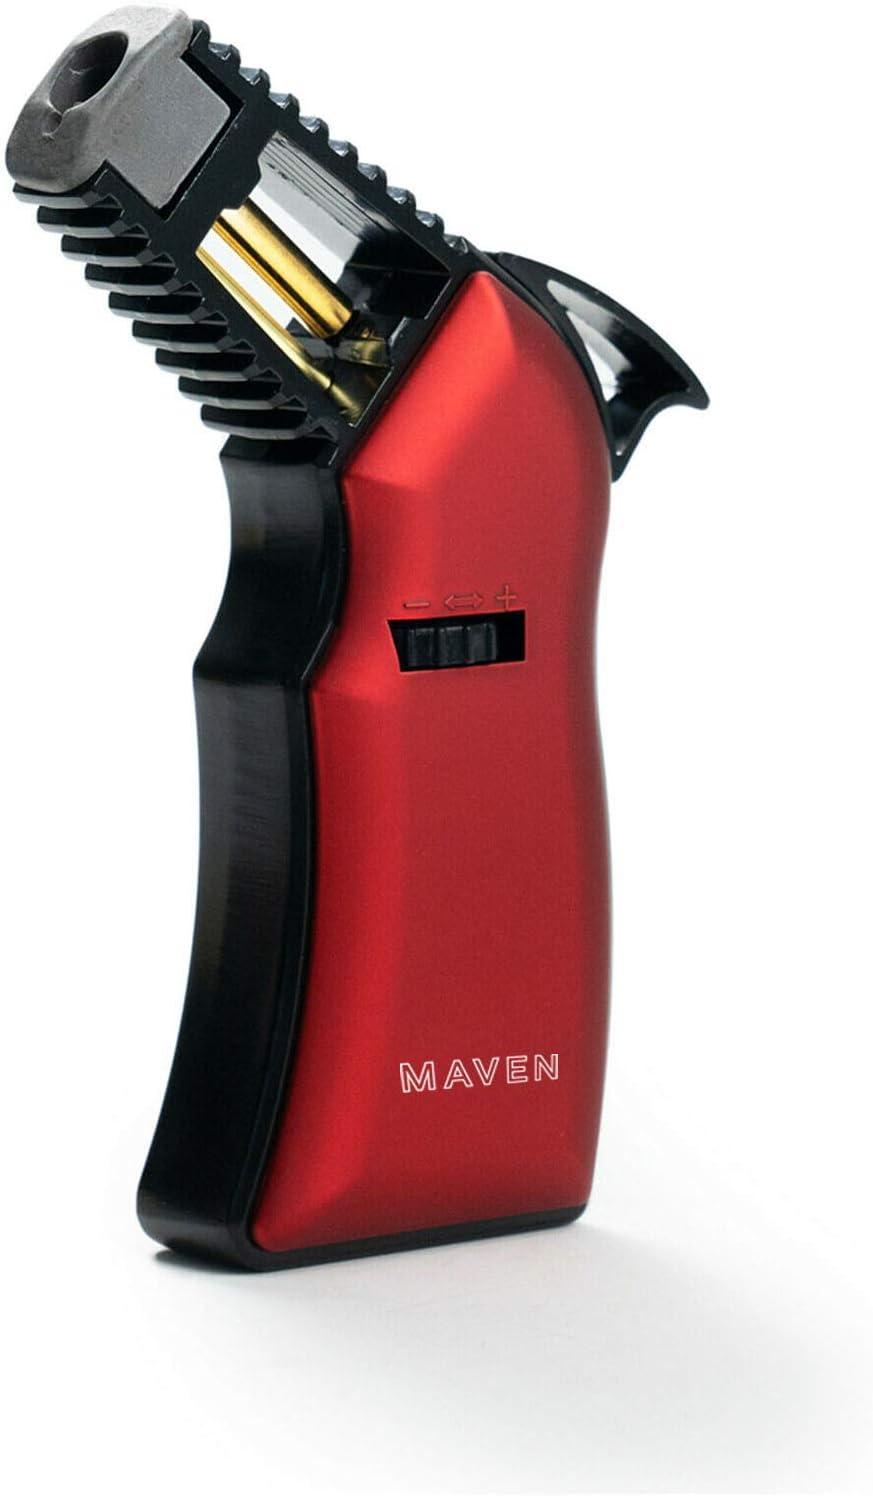 Maven 2021 model Perfect Max 86% OFF Machine Premium Angled Torch Jet Handheld Single